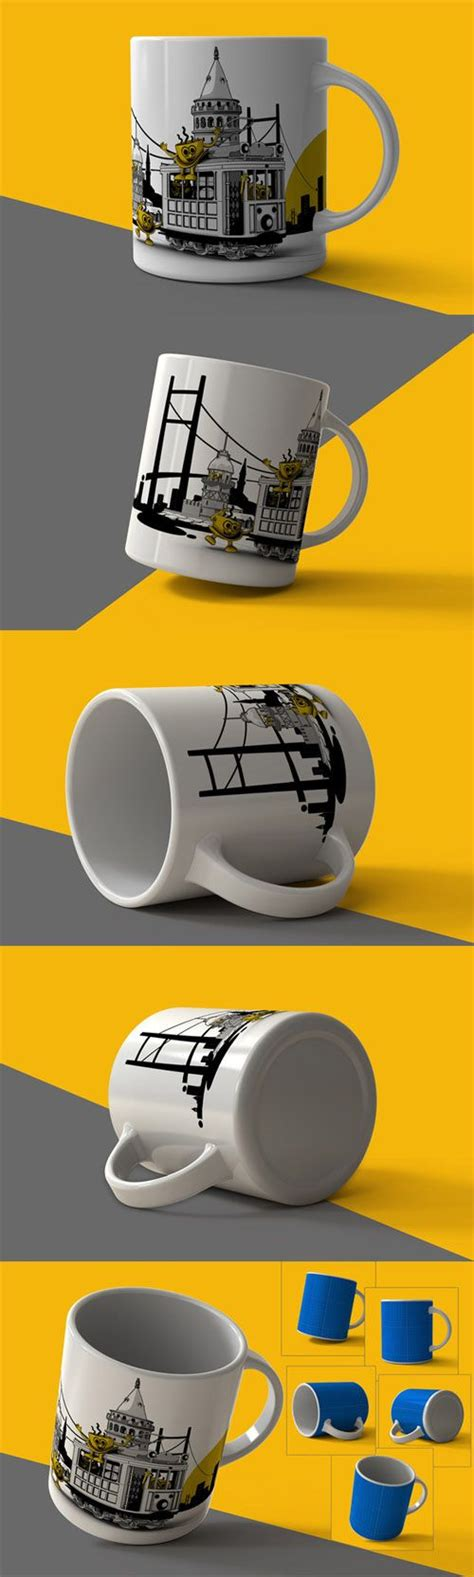 graphic design photoshop mug by listing store 77800541 135 best mockups images on pinterest miniatures mockup